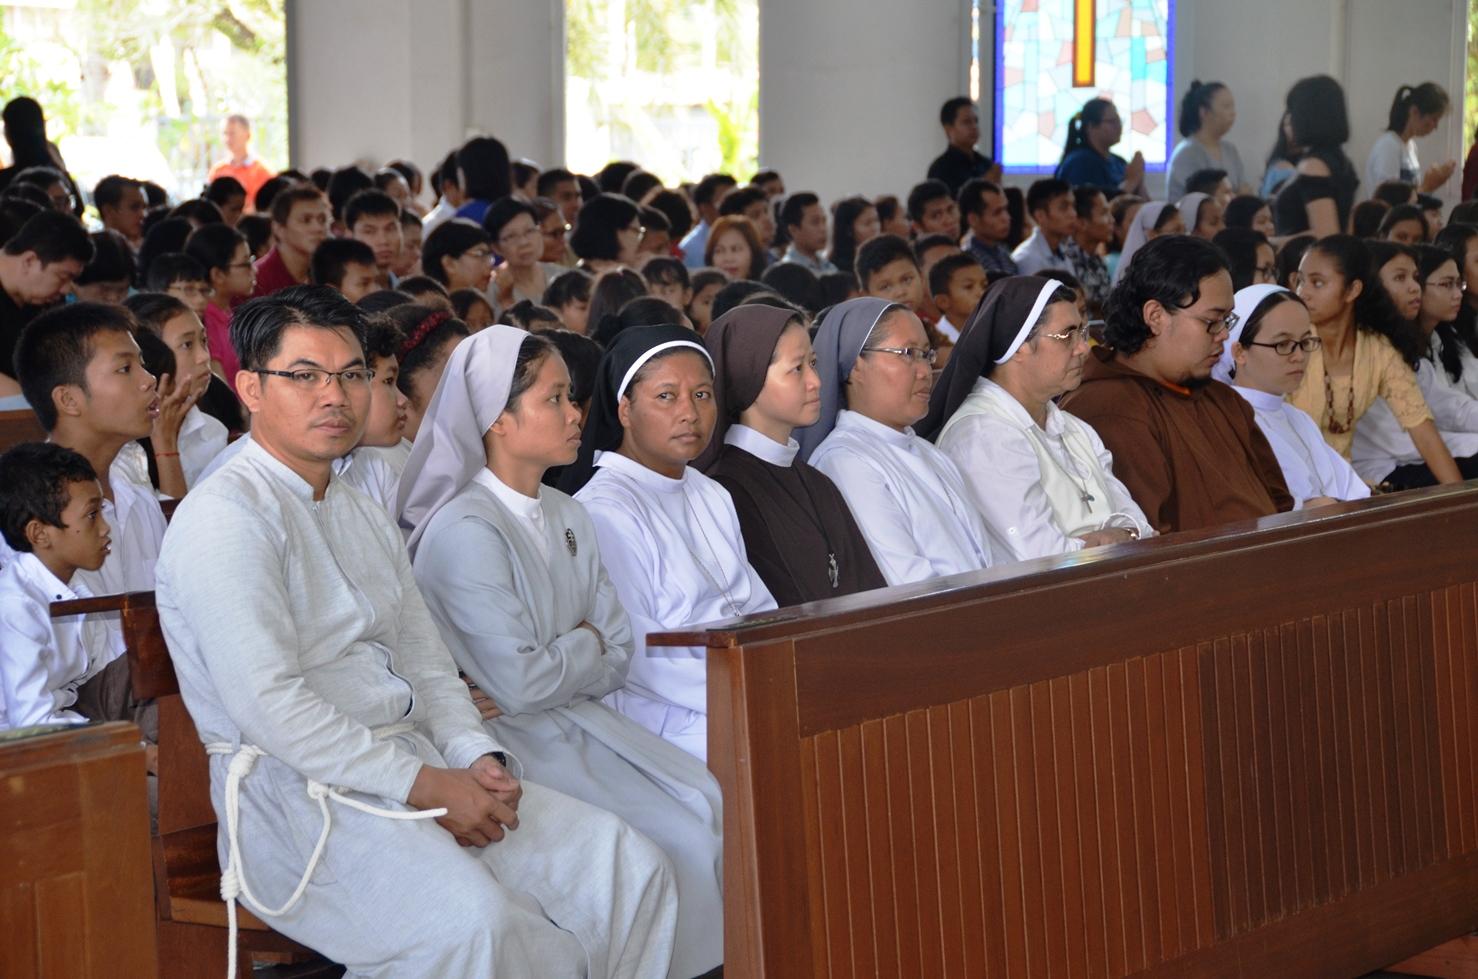 Parrocchia della Sacra Famiglia a Kota Baru, Pontianak (West Kalimantan) 10